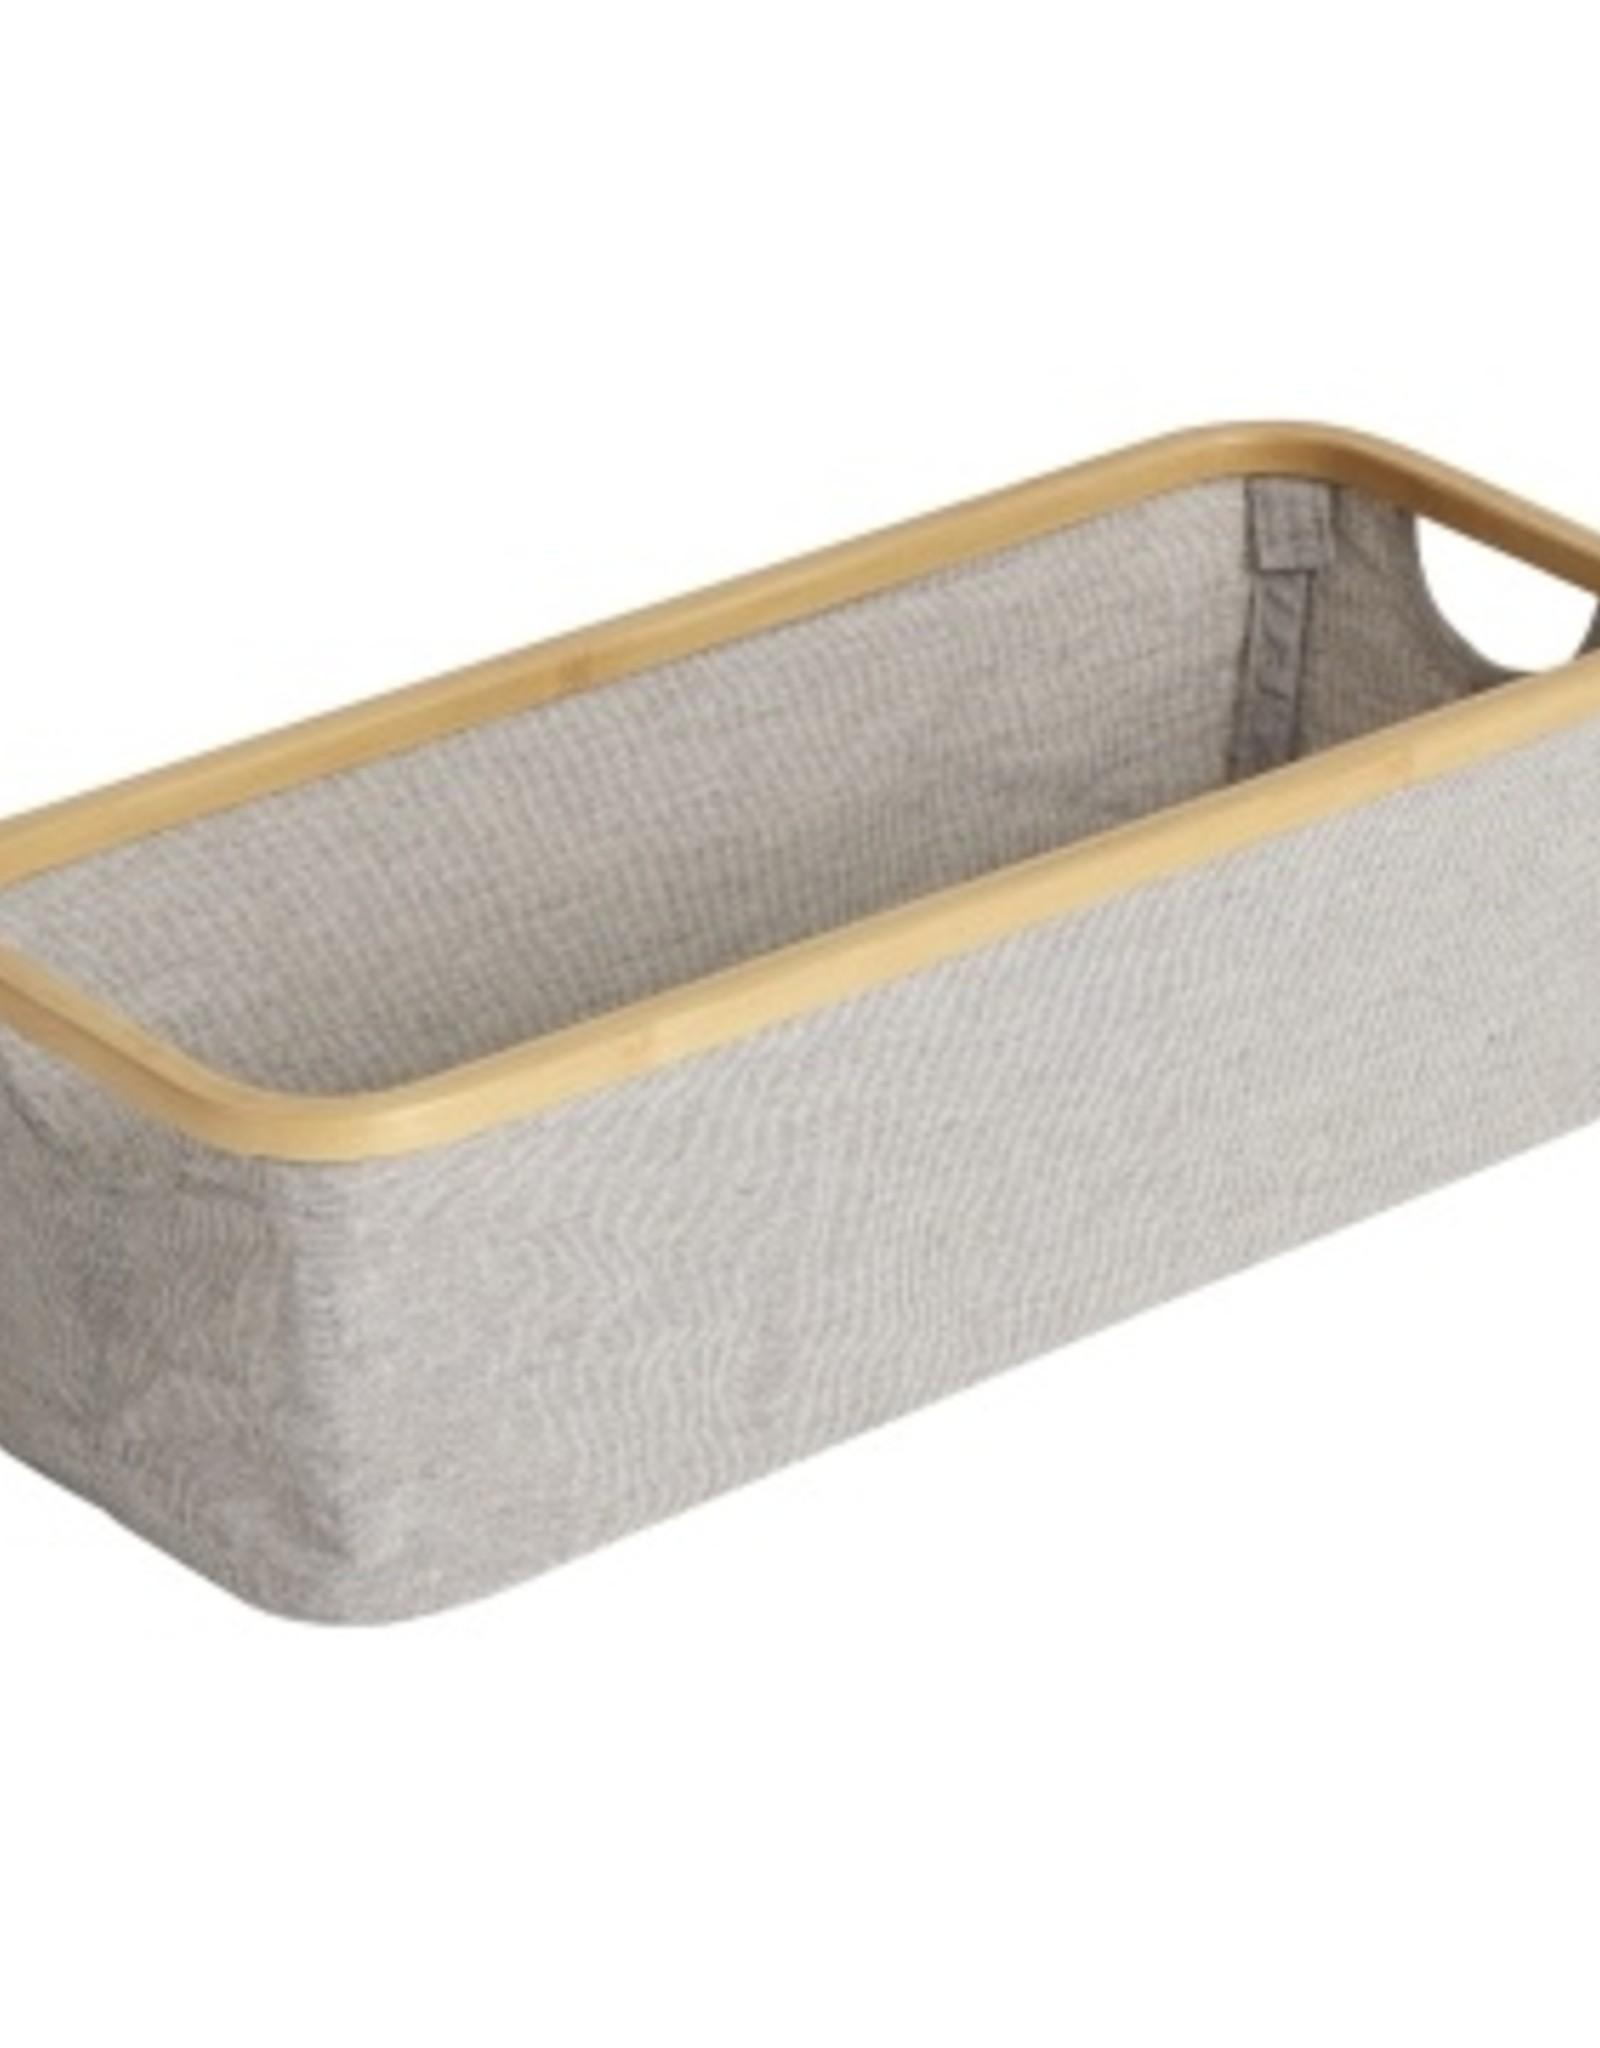 Quax Mand Katoen/bamboe - Luiertafel